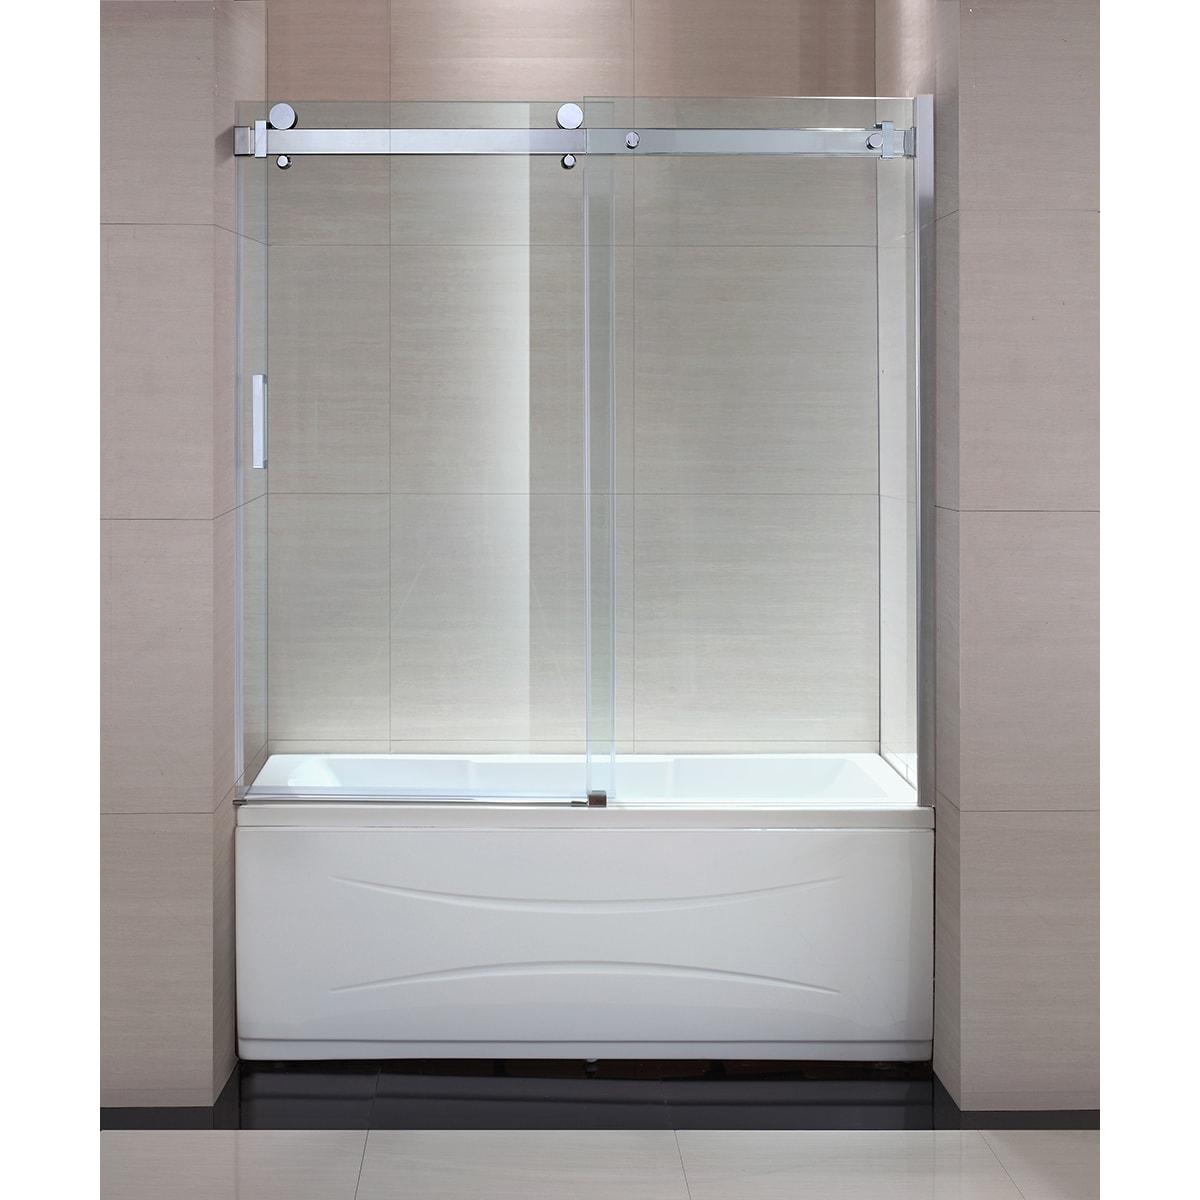 Shop Ove Decors Sierra Tub Door Free Shipping Today Overstock